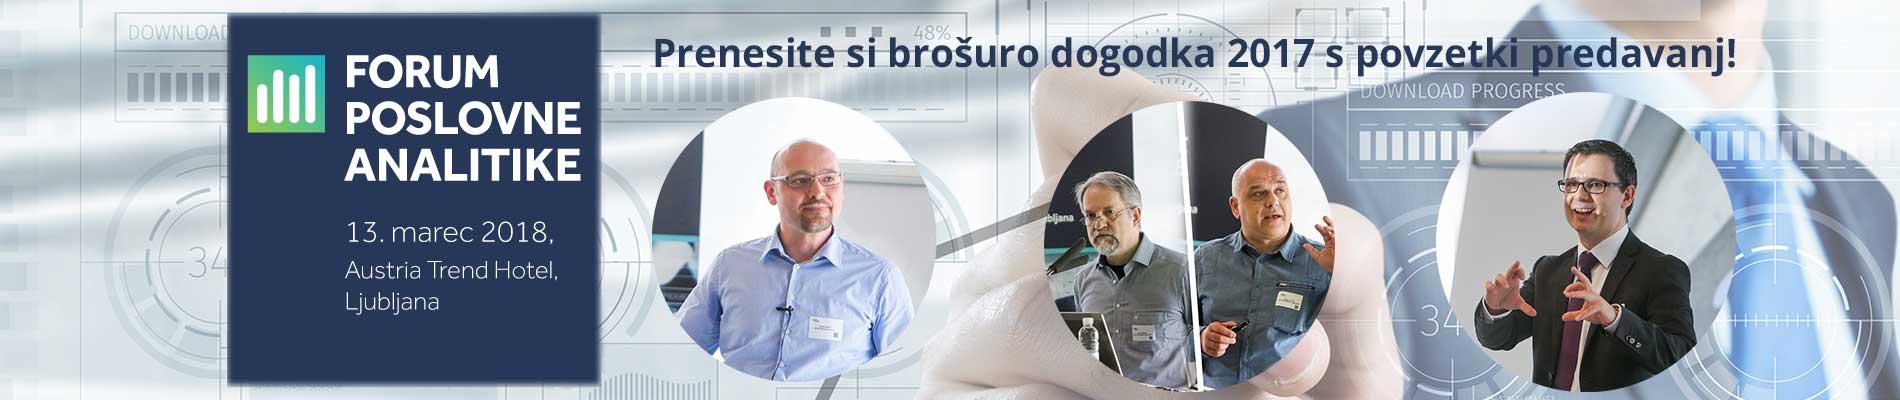 forum_poslovne_analitike_1900x400_prenos_brosure